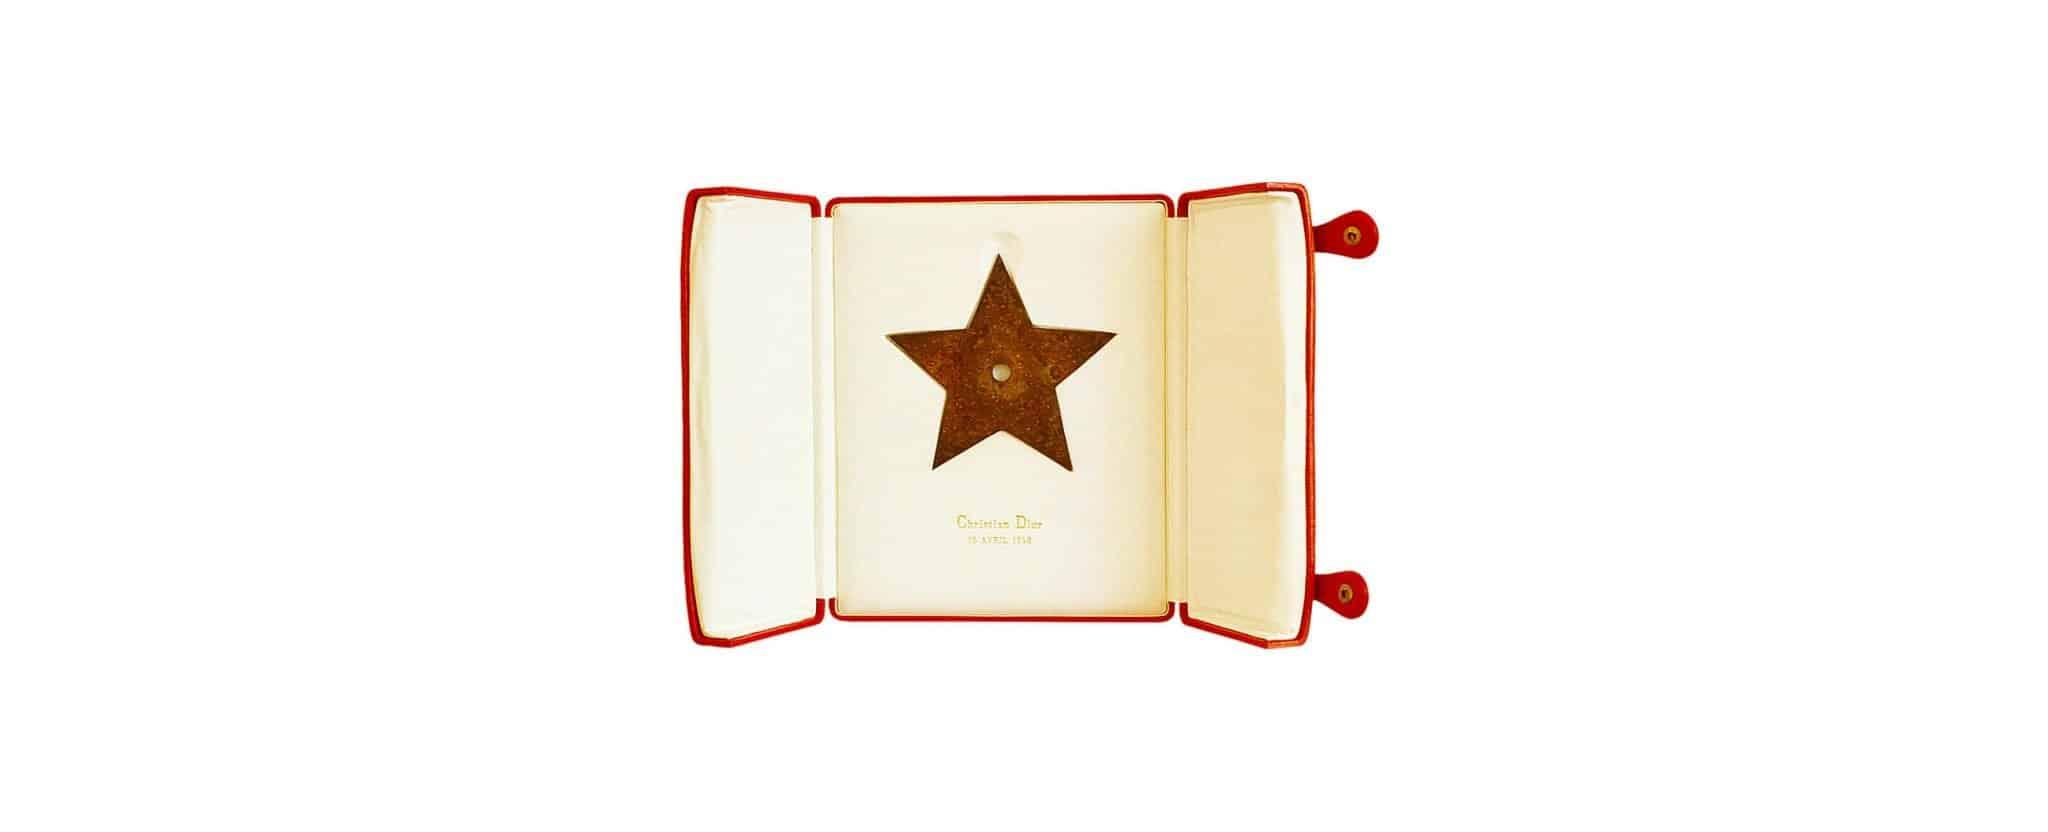 Christian Dior star sign